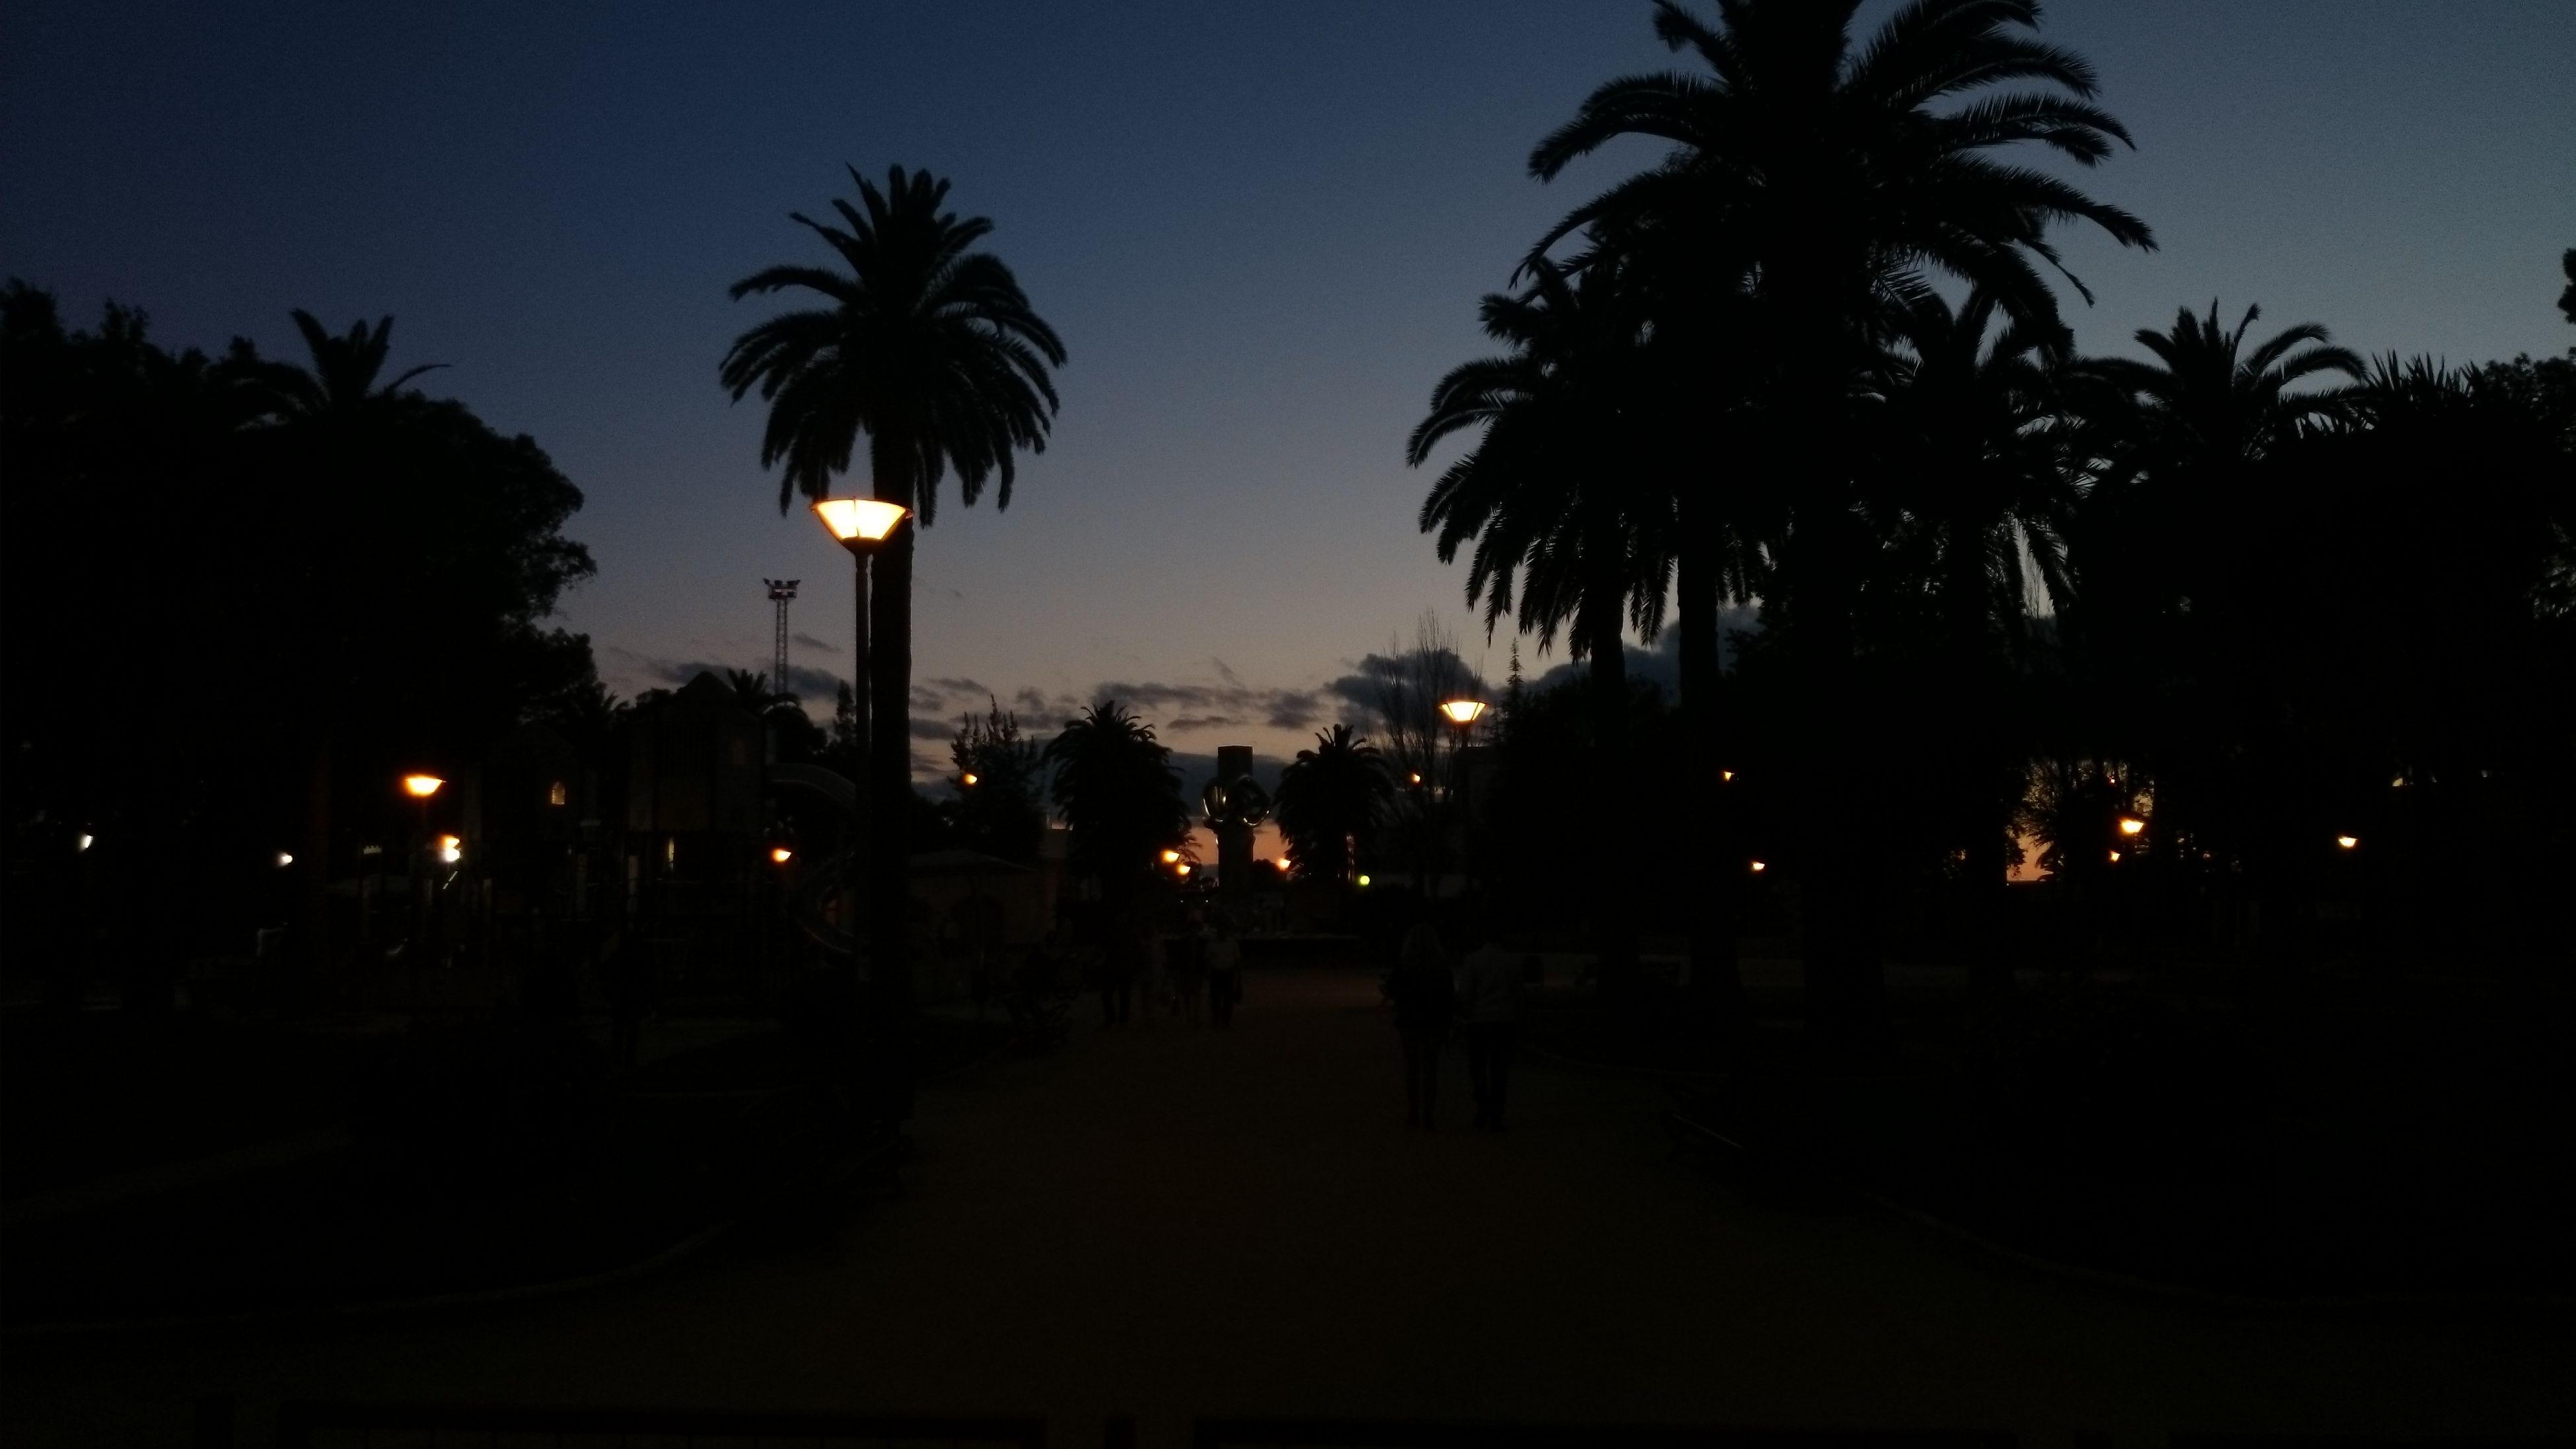 palm tree, tree, silhouette, illuminated, street light, sunset, sky, night, lighting equipment, dusk, street, clear sky, road, transportation, car, city, outdoors, dark, growth, tree trunk